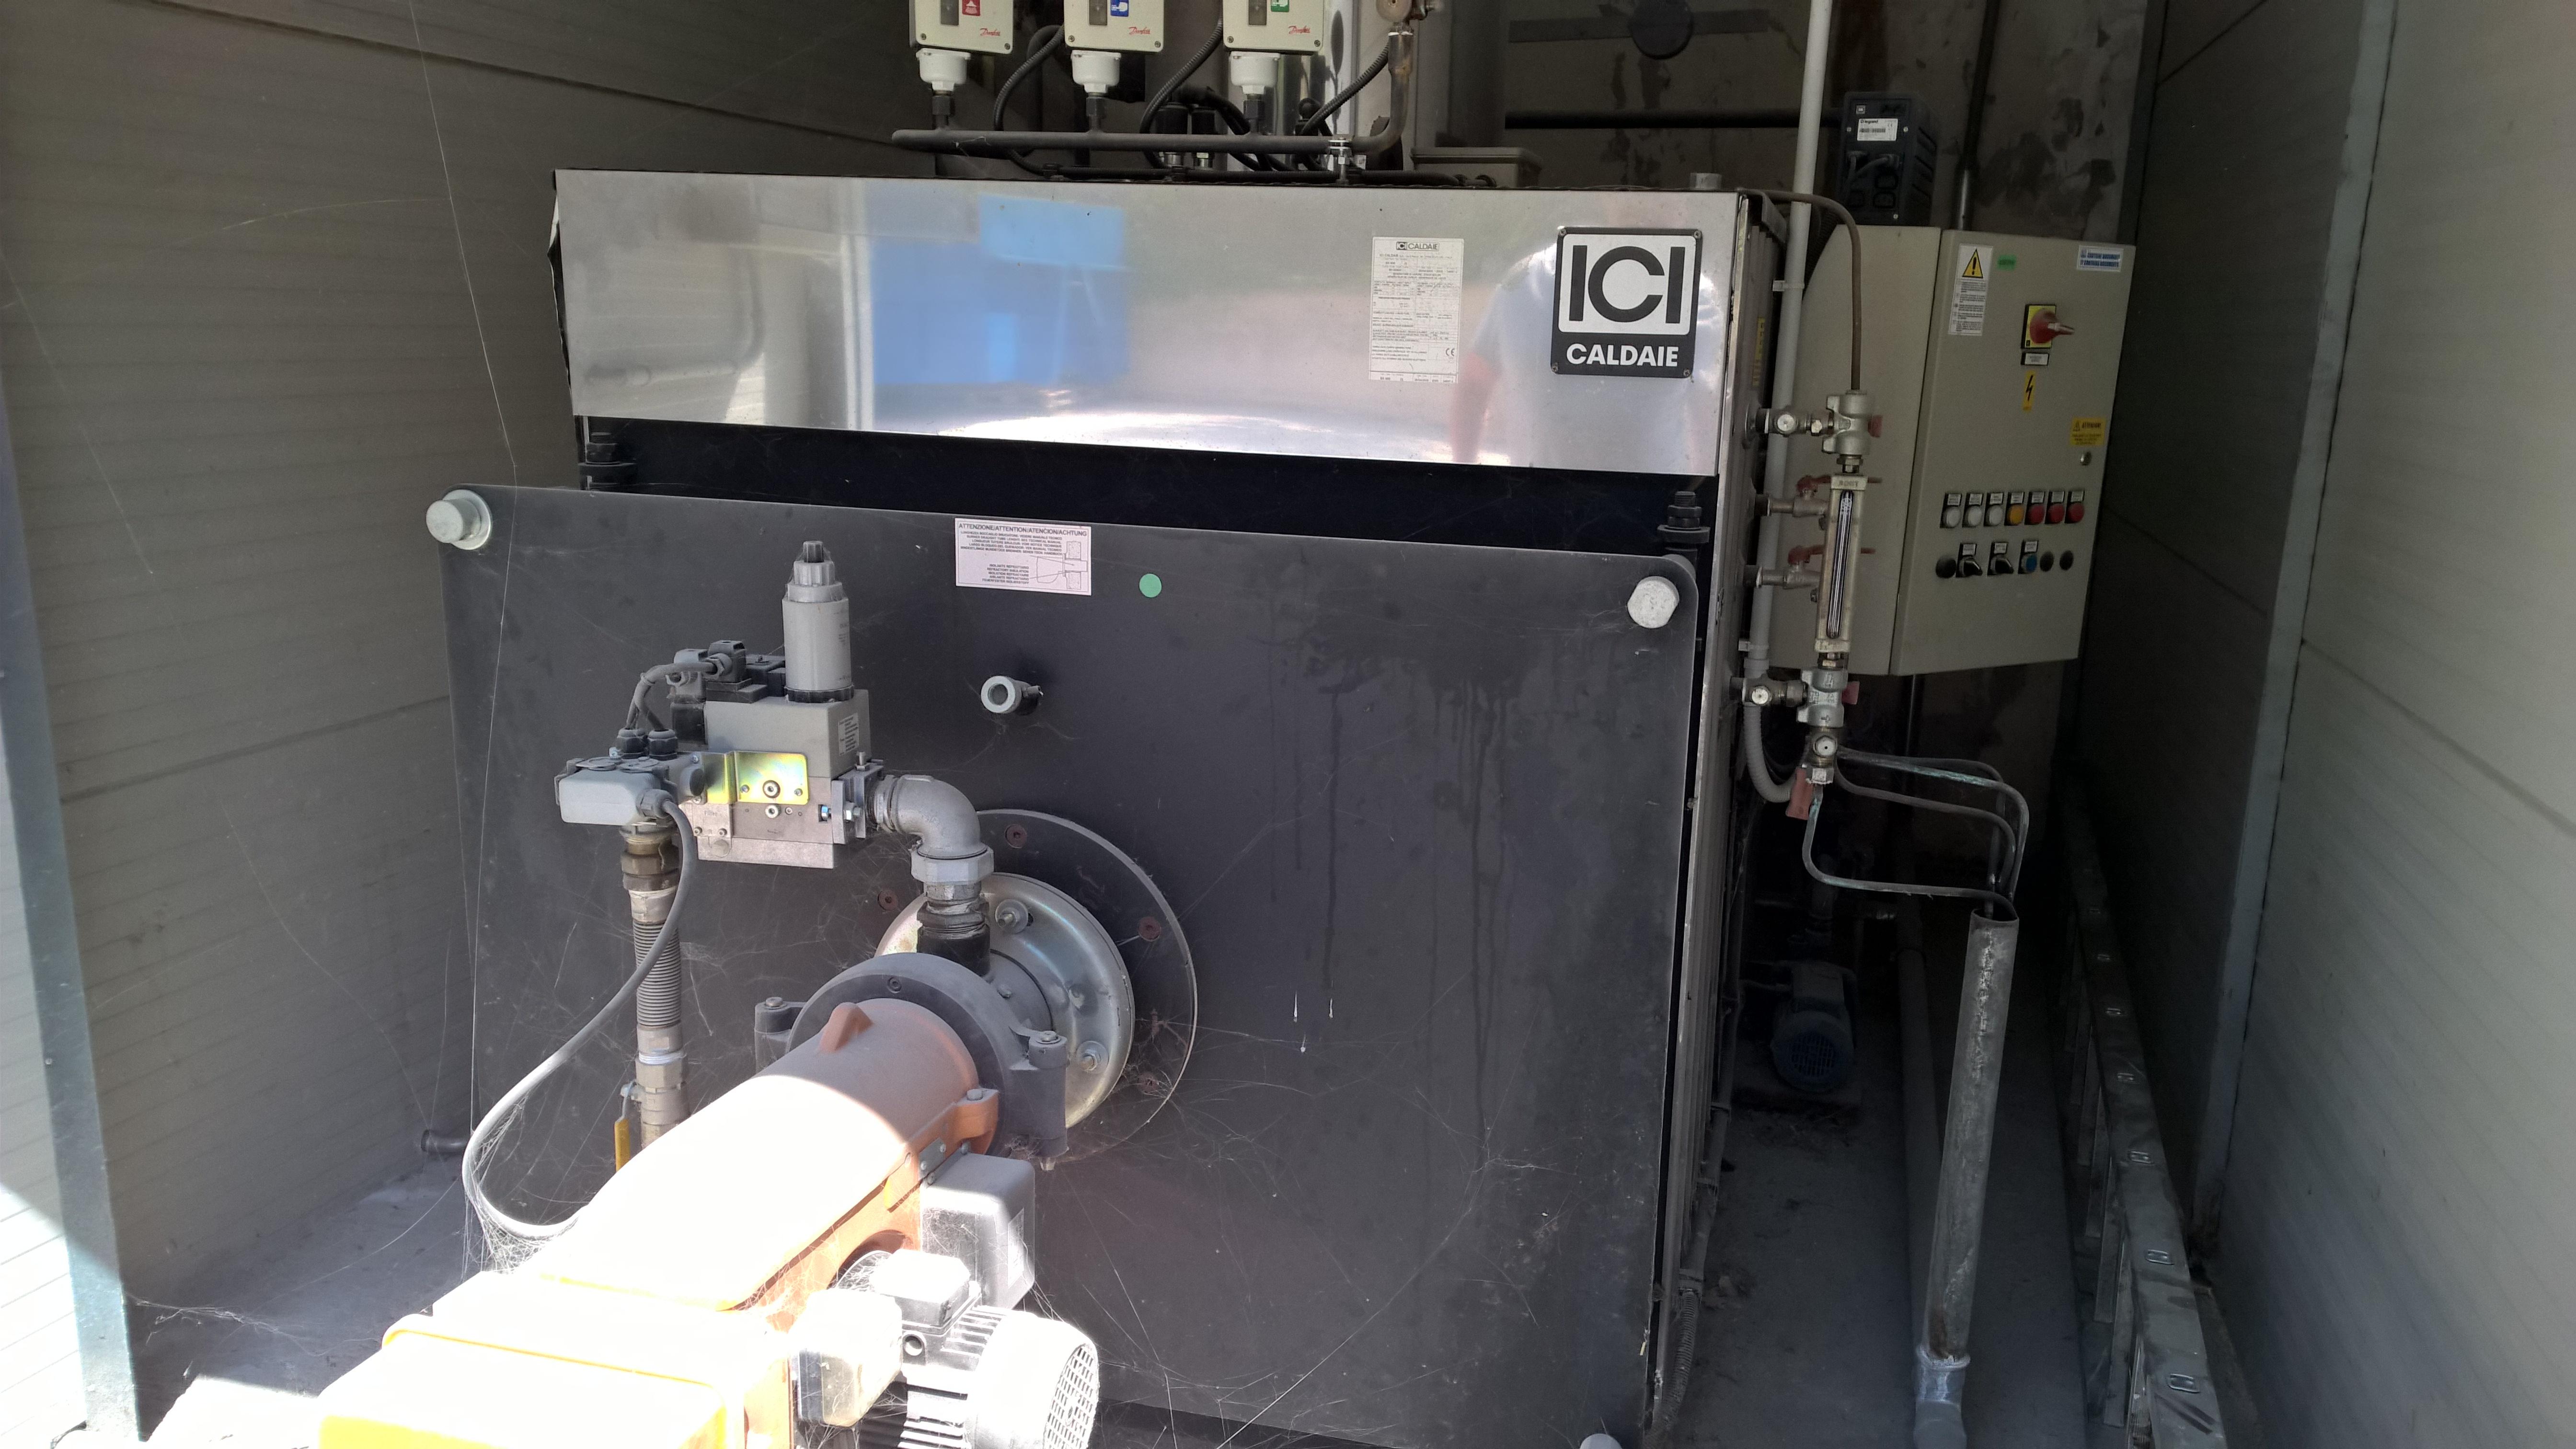 Caldaia usata ici caldaie spa bx 600 macchinari usati exapro for Caldaia a nocciolino usata